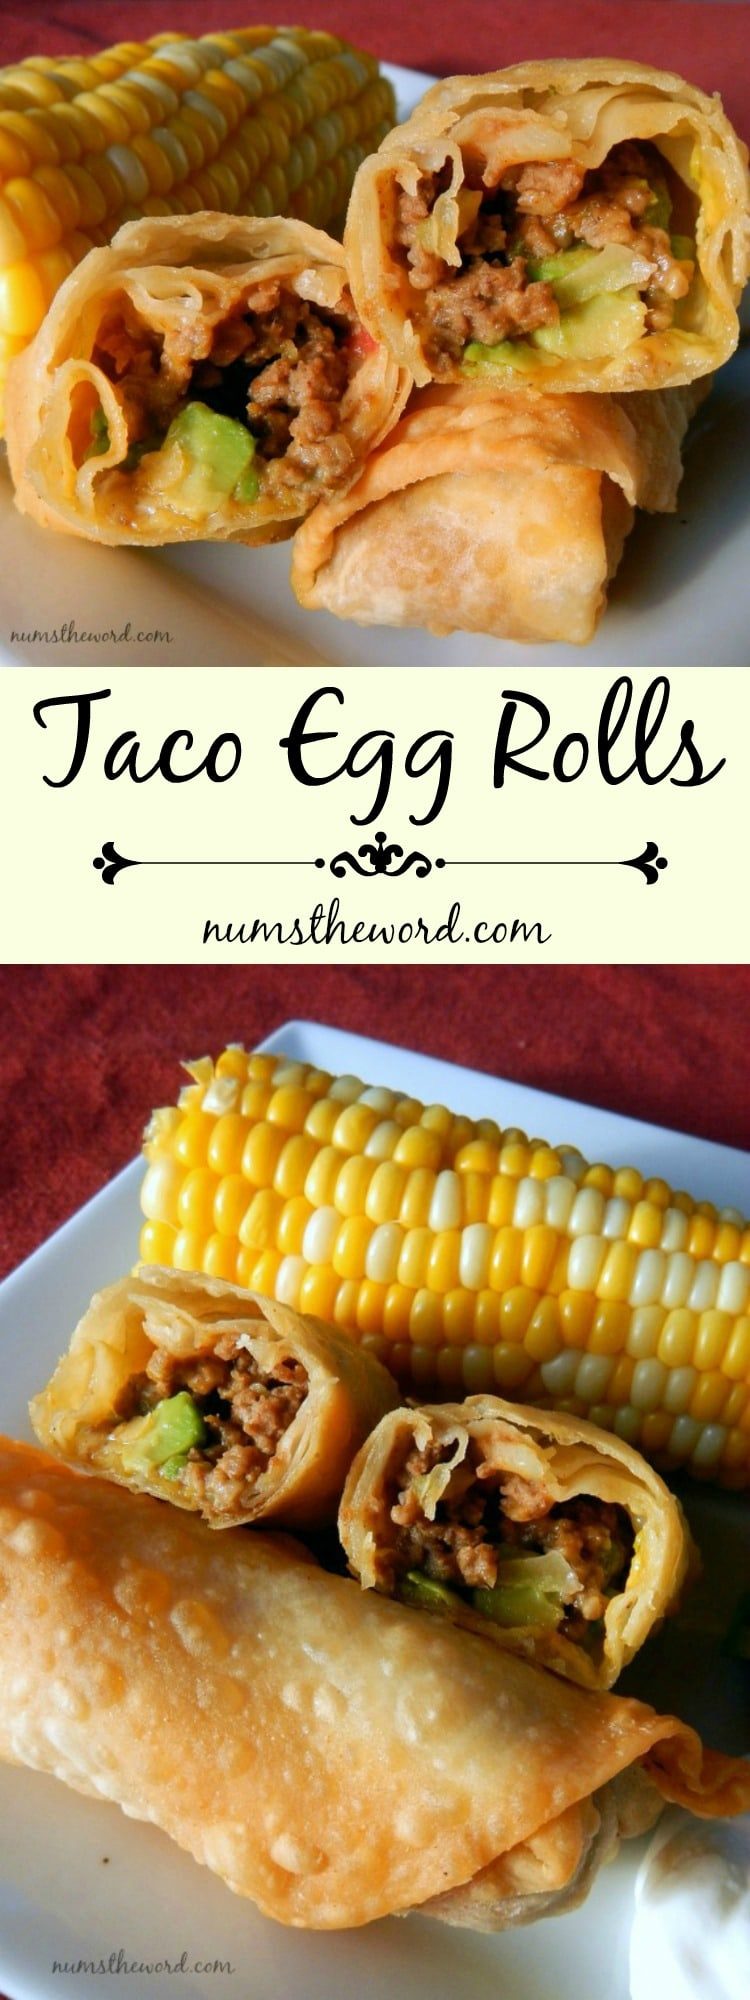 Taco Egg Rolls - Pinterest long pin collage